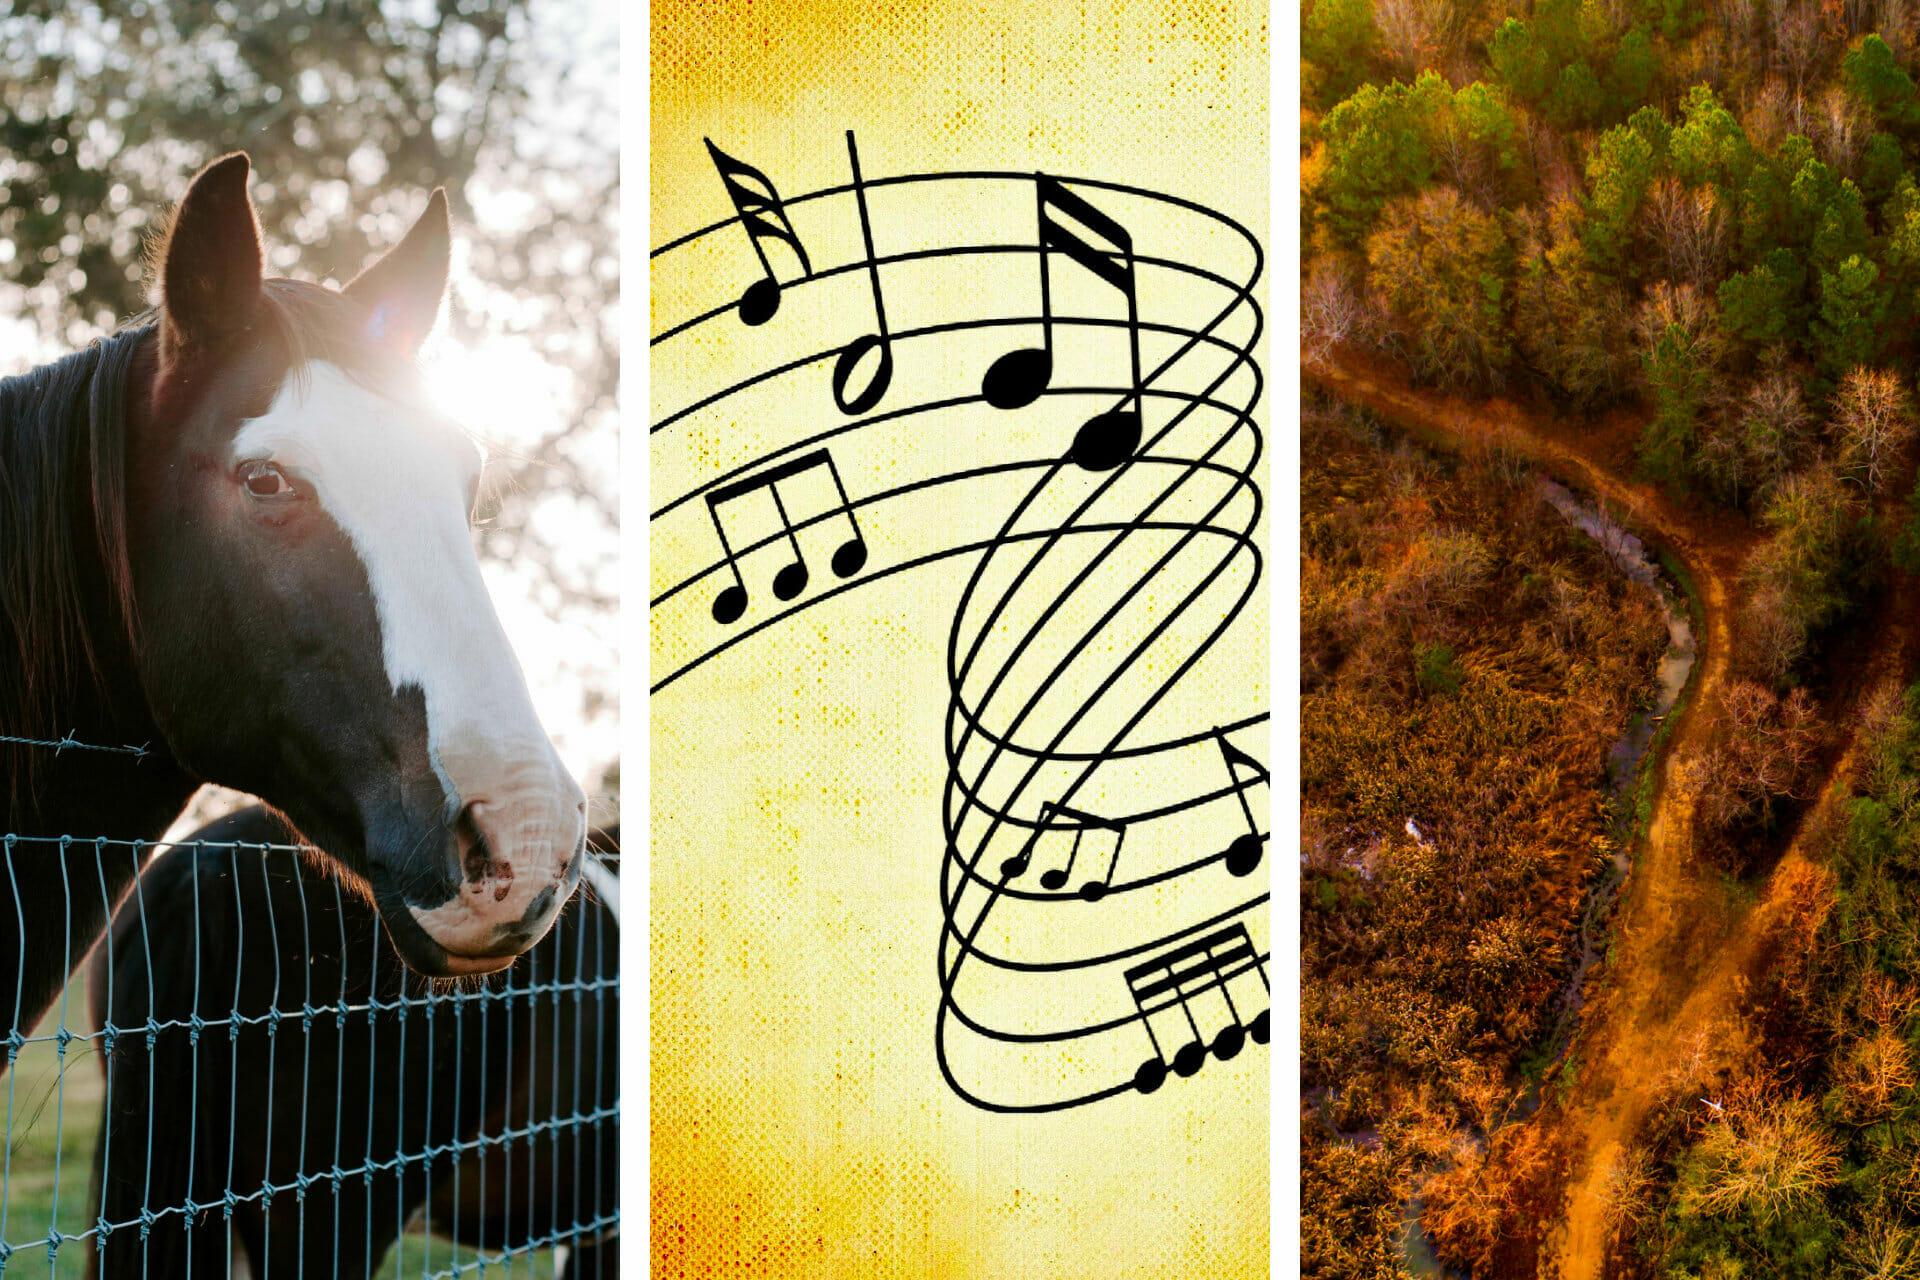 23+ Songs about Alabama to Inspire You via @allamericanatlas